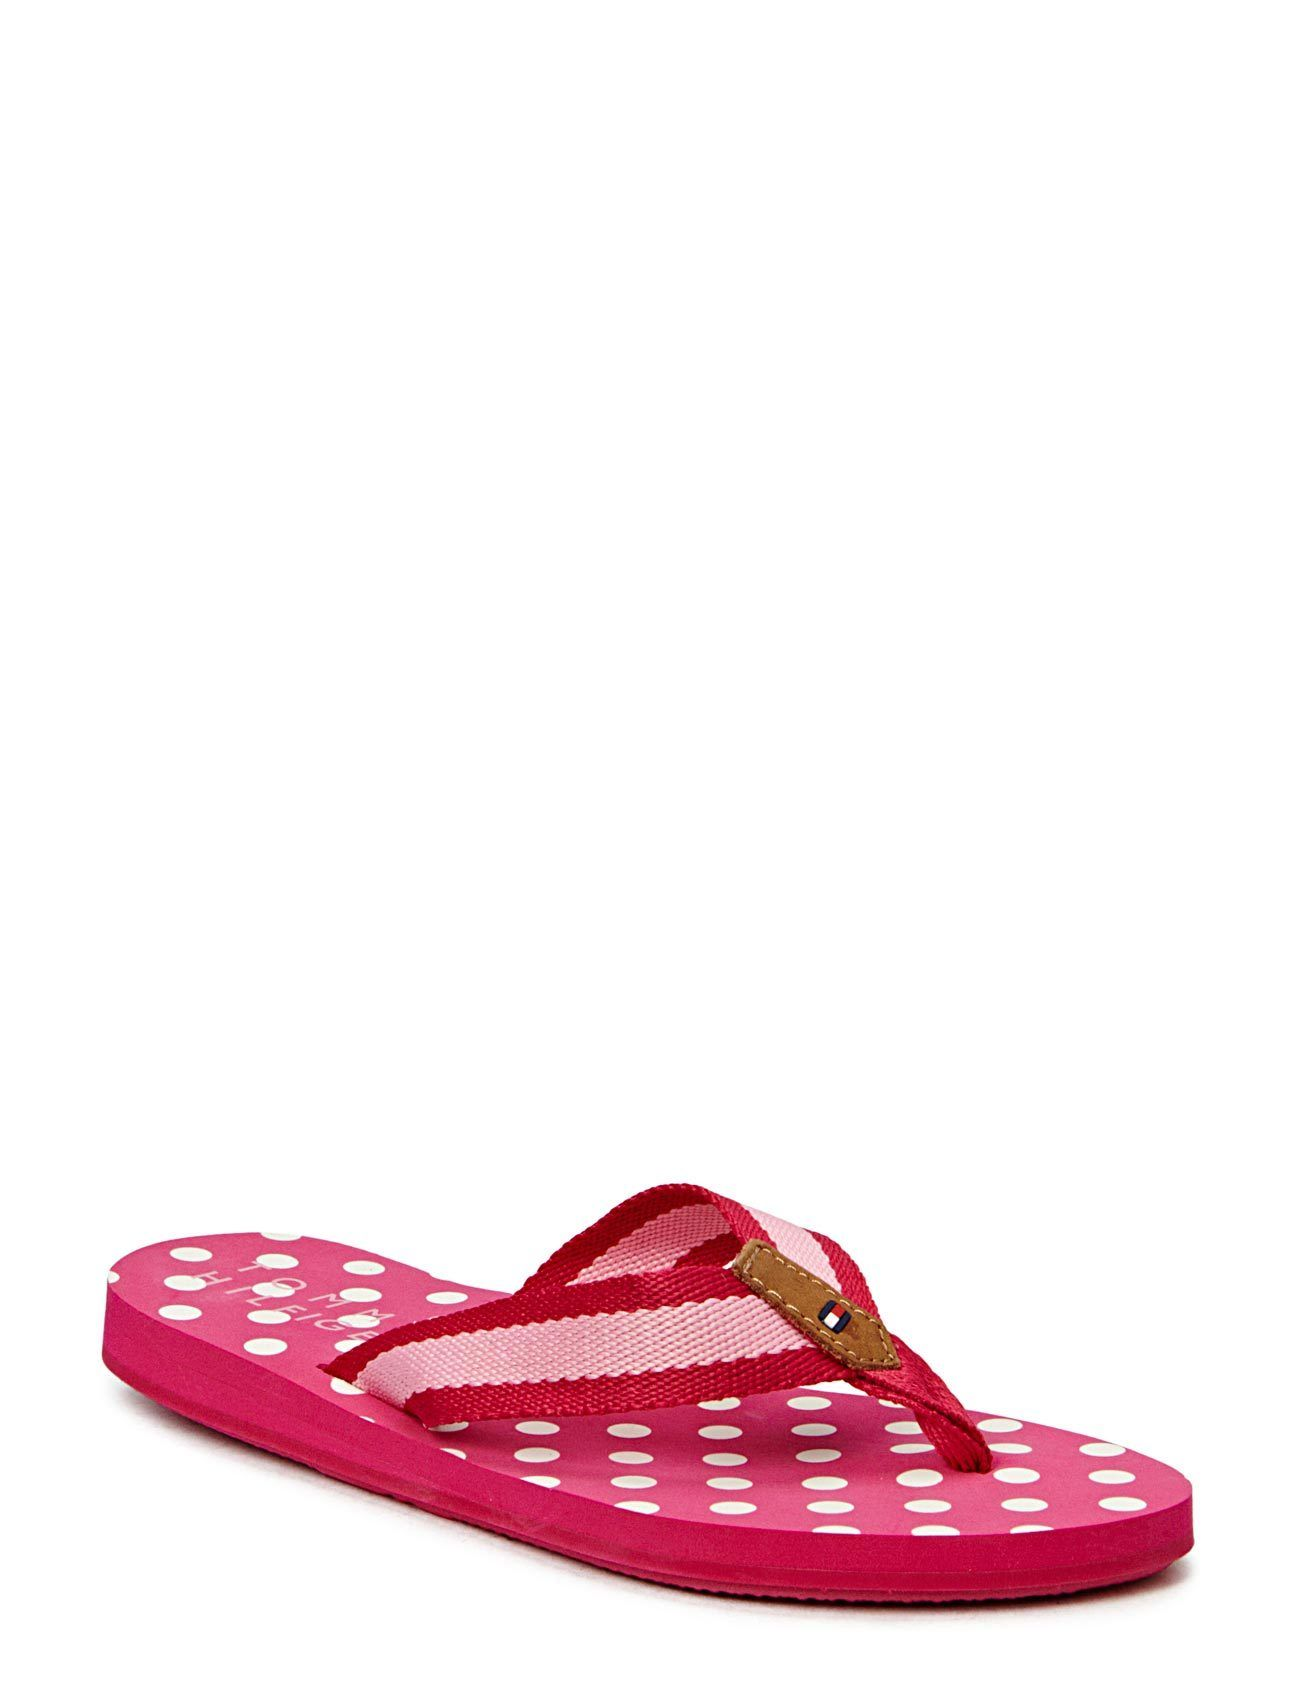 4131d5c3d9d Tommy Hilfiger Shoes - Monica 8 A. Tommy Hilfiger ShoesFlip FlopsLoversBeach  Sandals